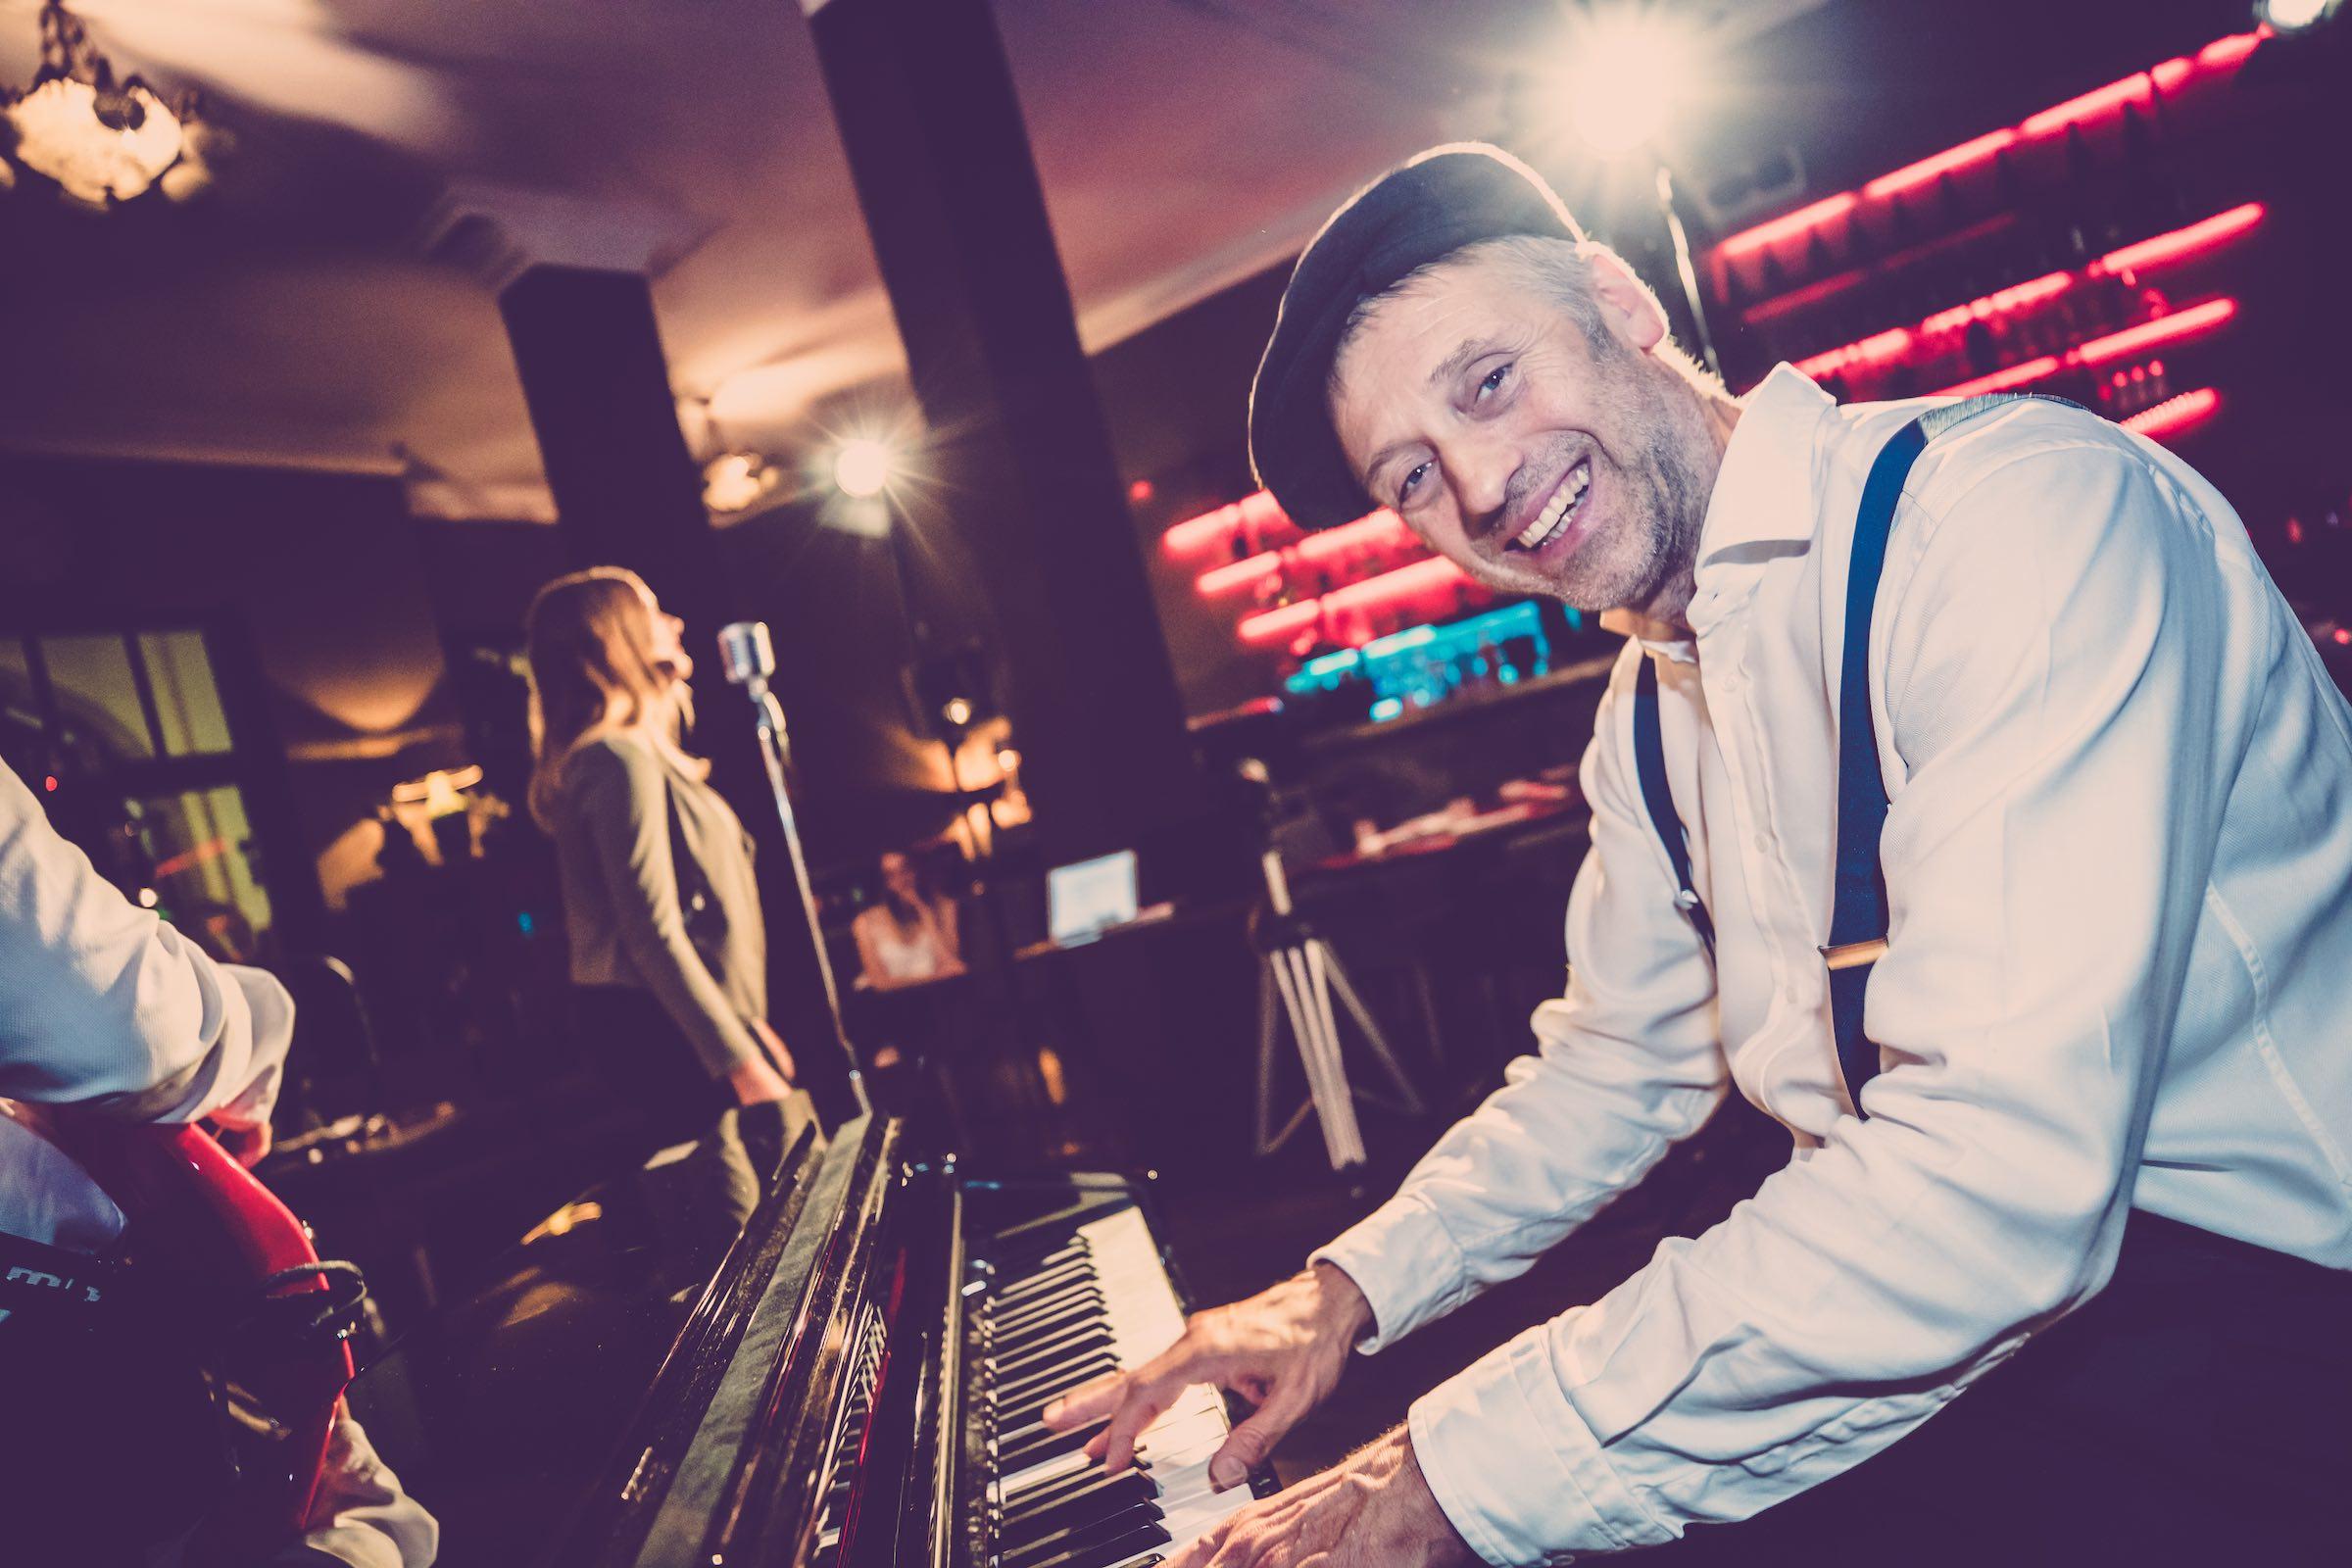 Pianist   Klavierspieler   Hannover   Flügel   Piano   Hochzeit   Buchen   Livemusik   Jazz   Swing   Pop   Party   Motown   Soul   Klavier   Messe   Firmenfeier   Empfang   Buchen   Mieten   Anfragen   Lehmann   Eventservice